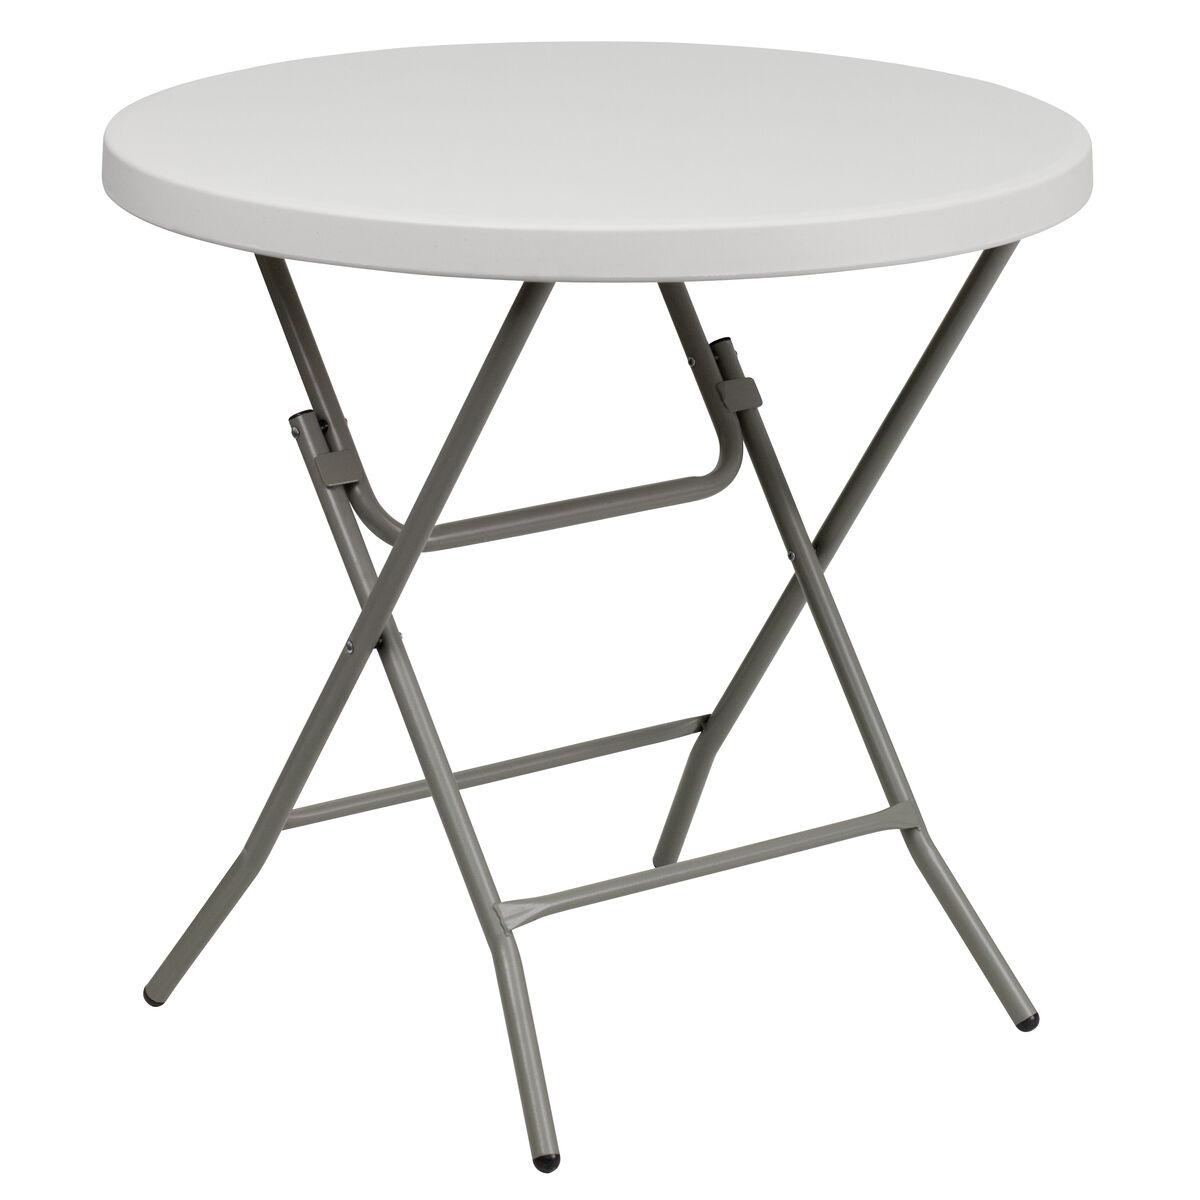 32rd White Plastic Fold Table Rb 32r Gw Gg